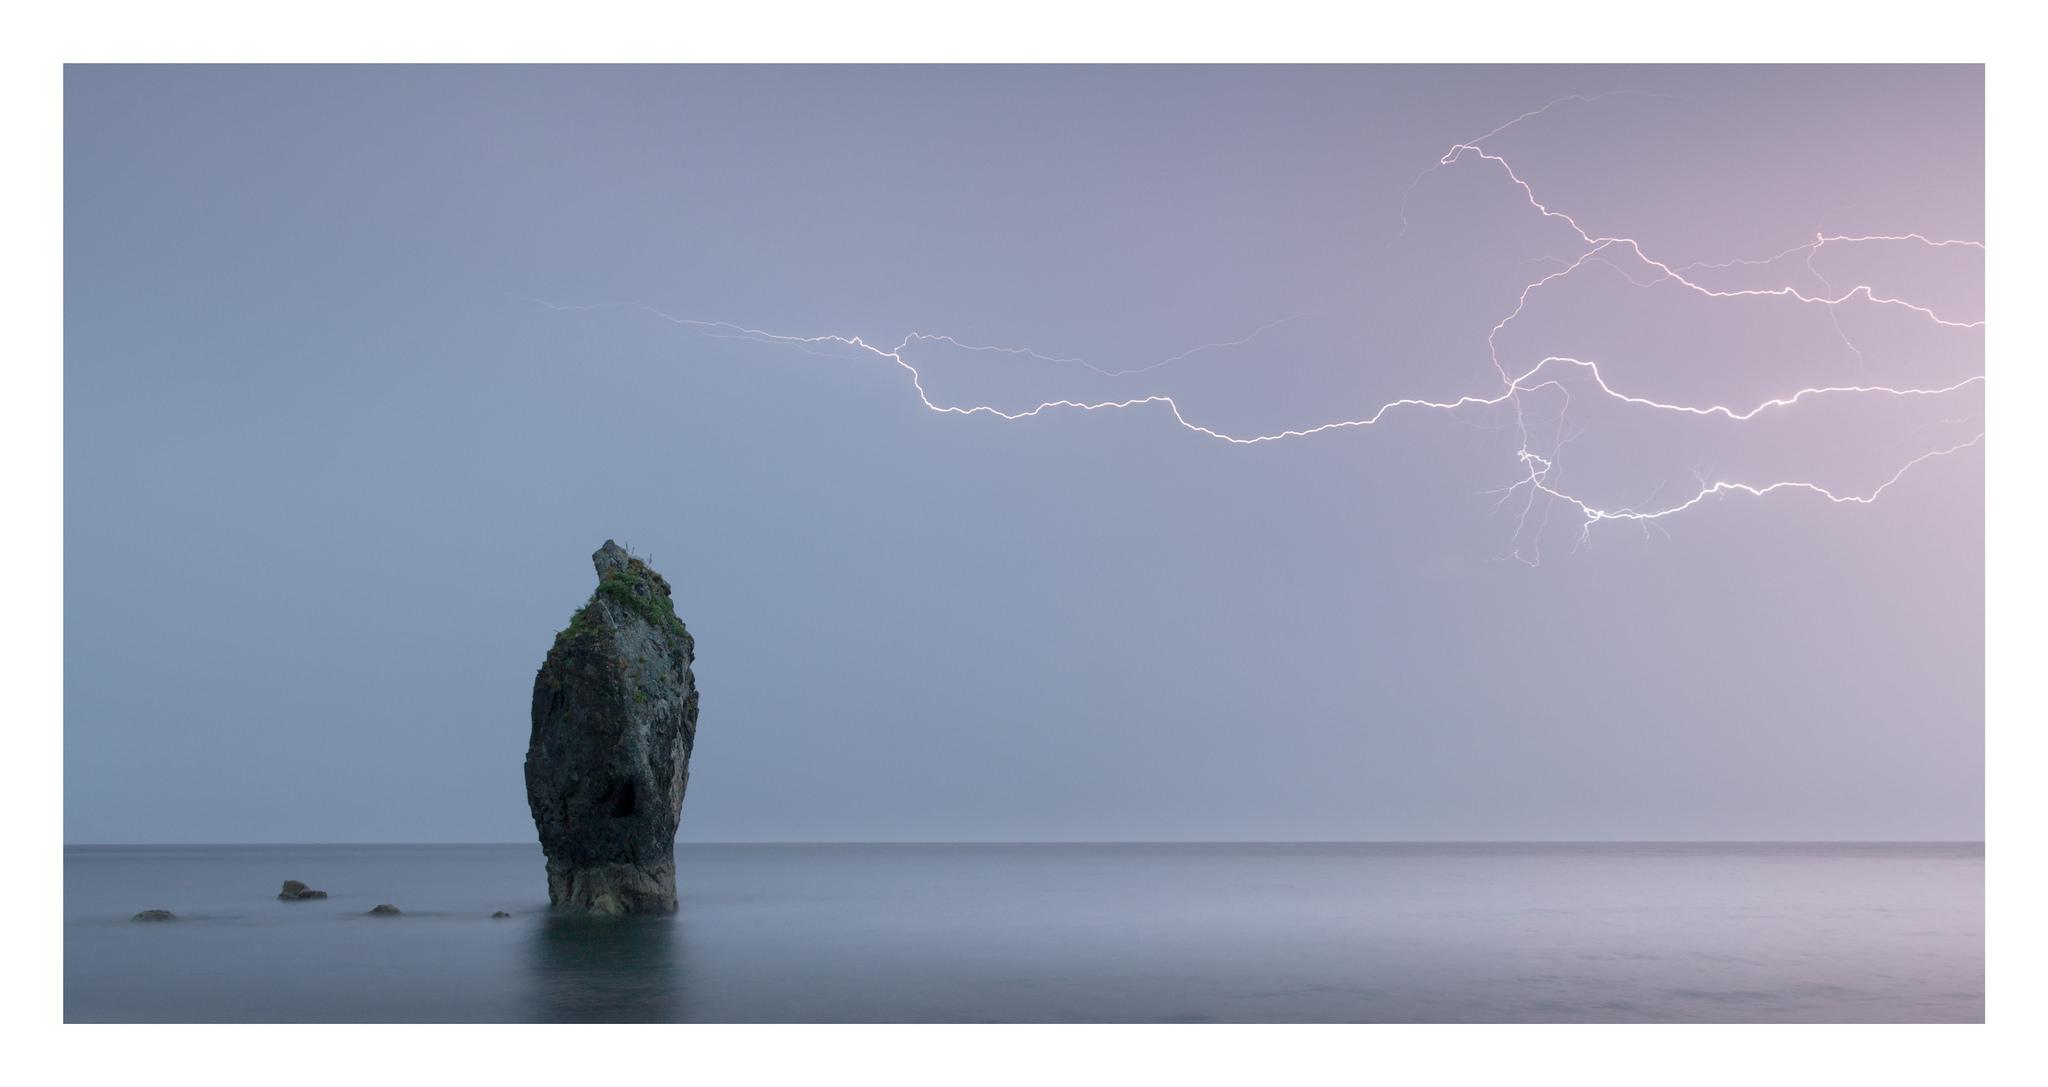 ballydowane beach lightning - ballydowane beach